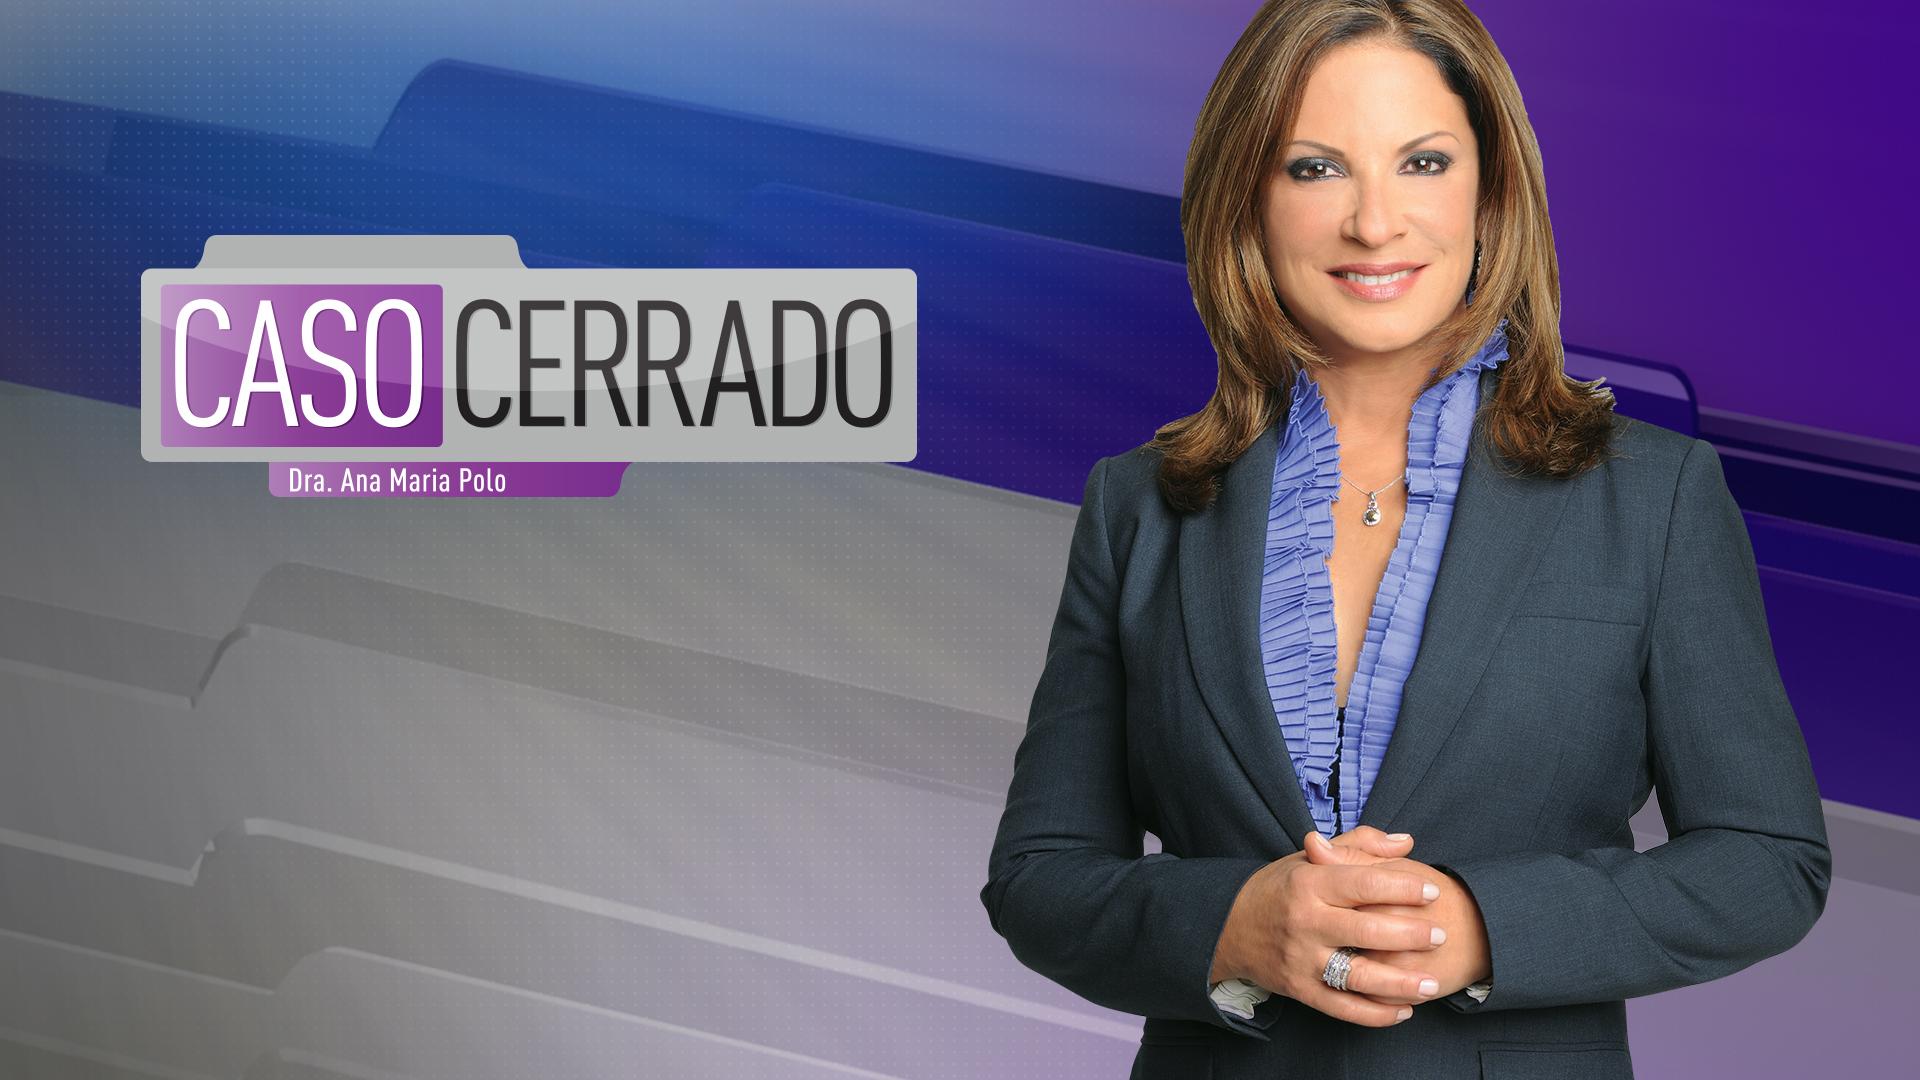 http://www.telemundo.com/sites/nbcutelemundo/files/sites/nbcutelemundo/files/images/tv_show/10_CasoCerrado_1920x1080_2.jpg